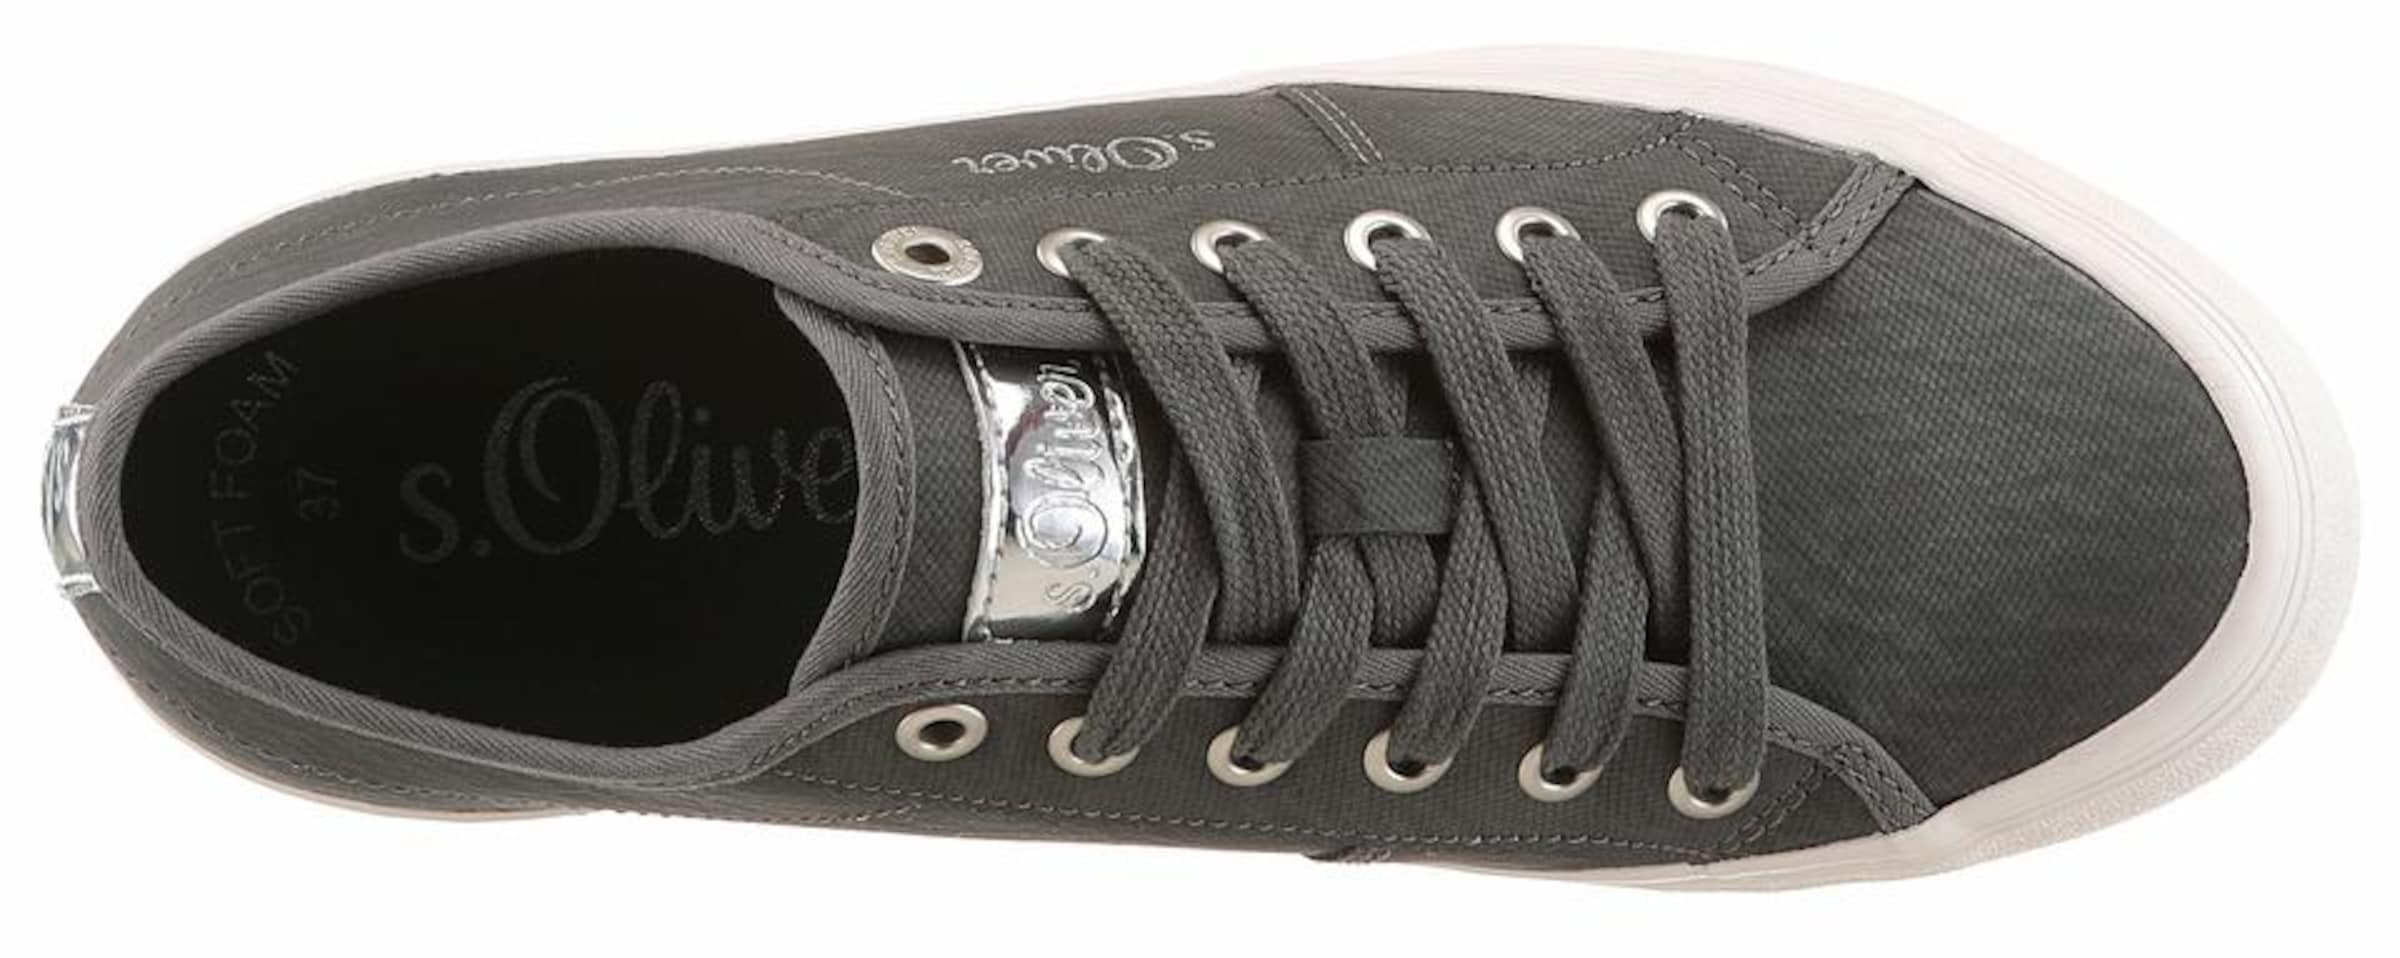 s.Oliver RED LABEL Sneaker Billige Browse 100% Garantiert Outlet-Store Günstig Online auN9b